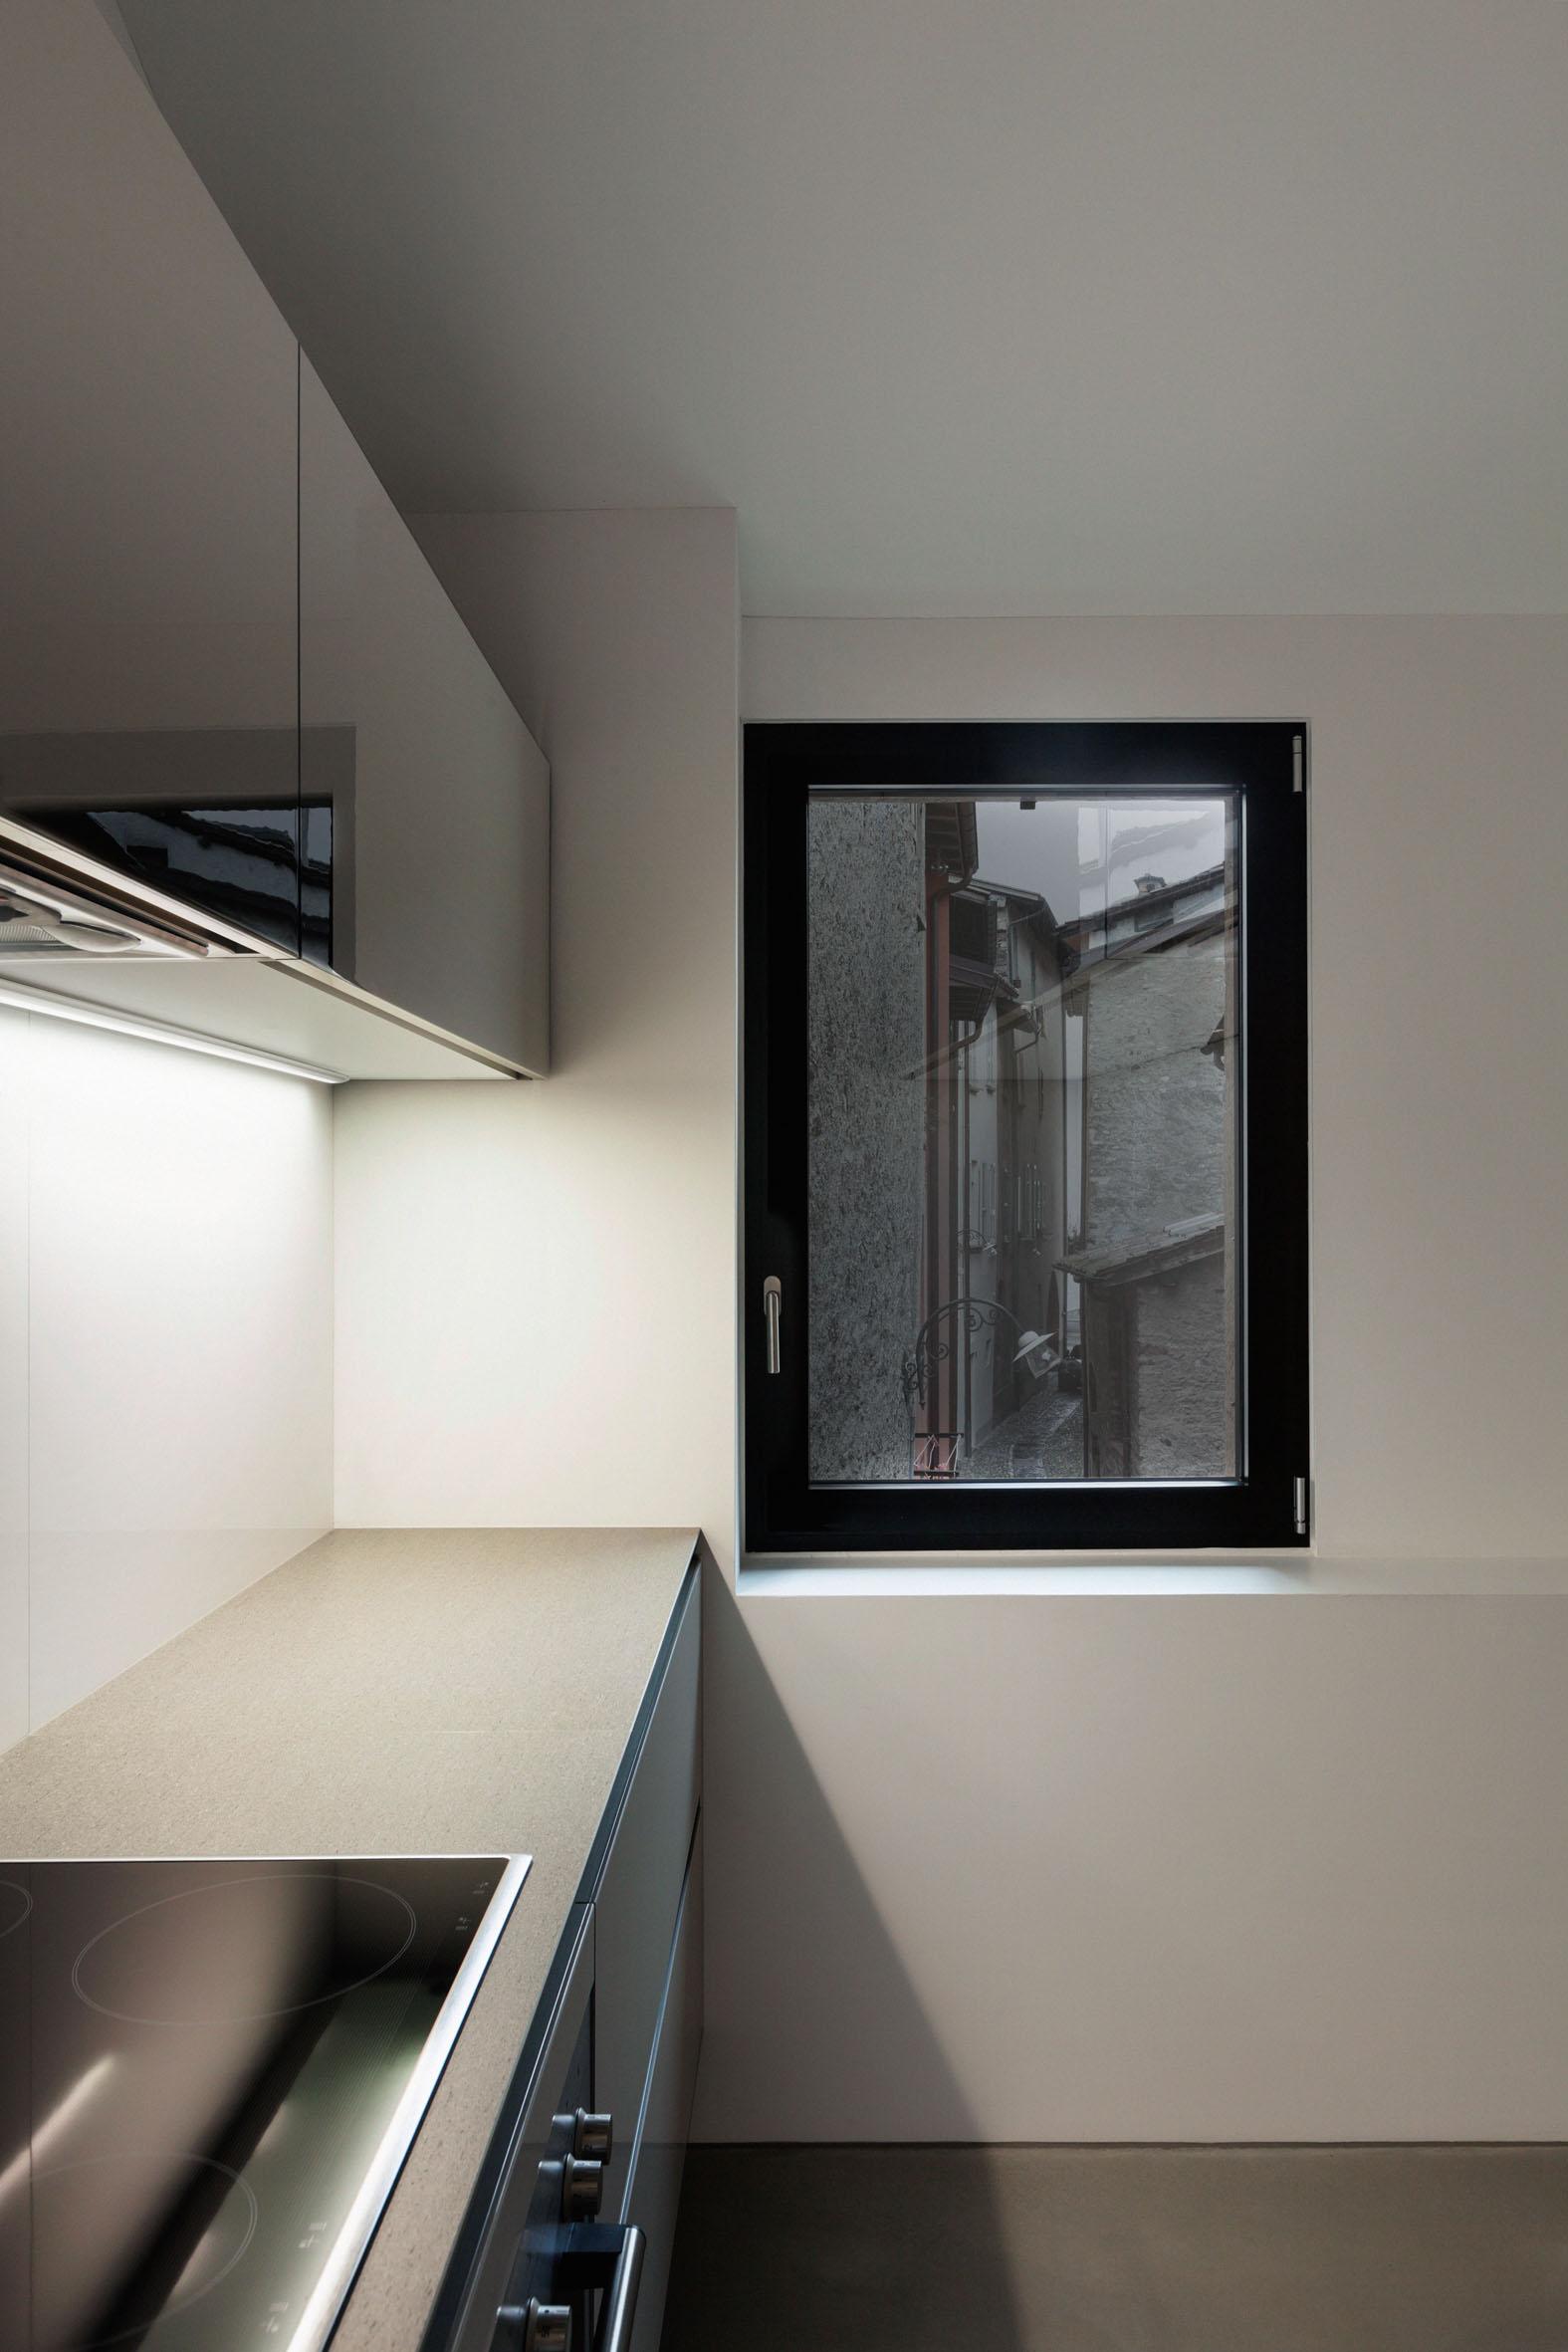 GALWAY Wandlamp LED 1x16W/1500lm Rechthoekig Wit